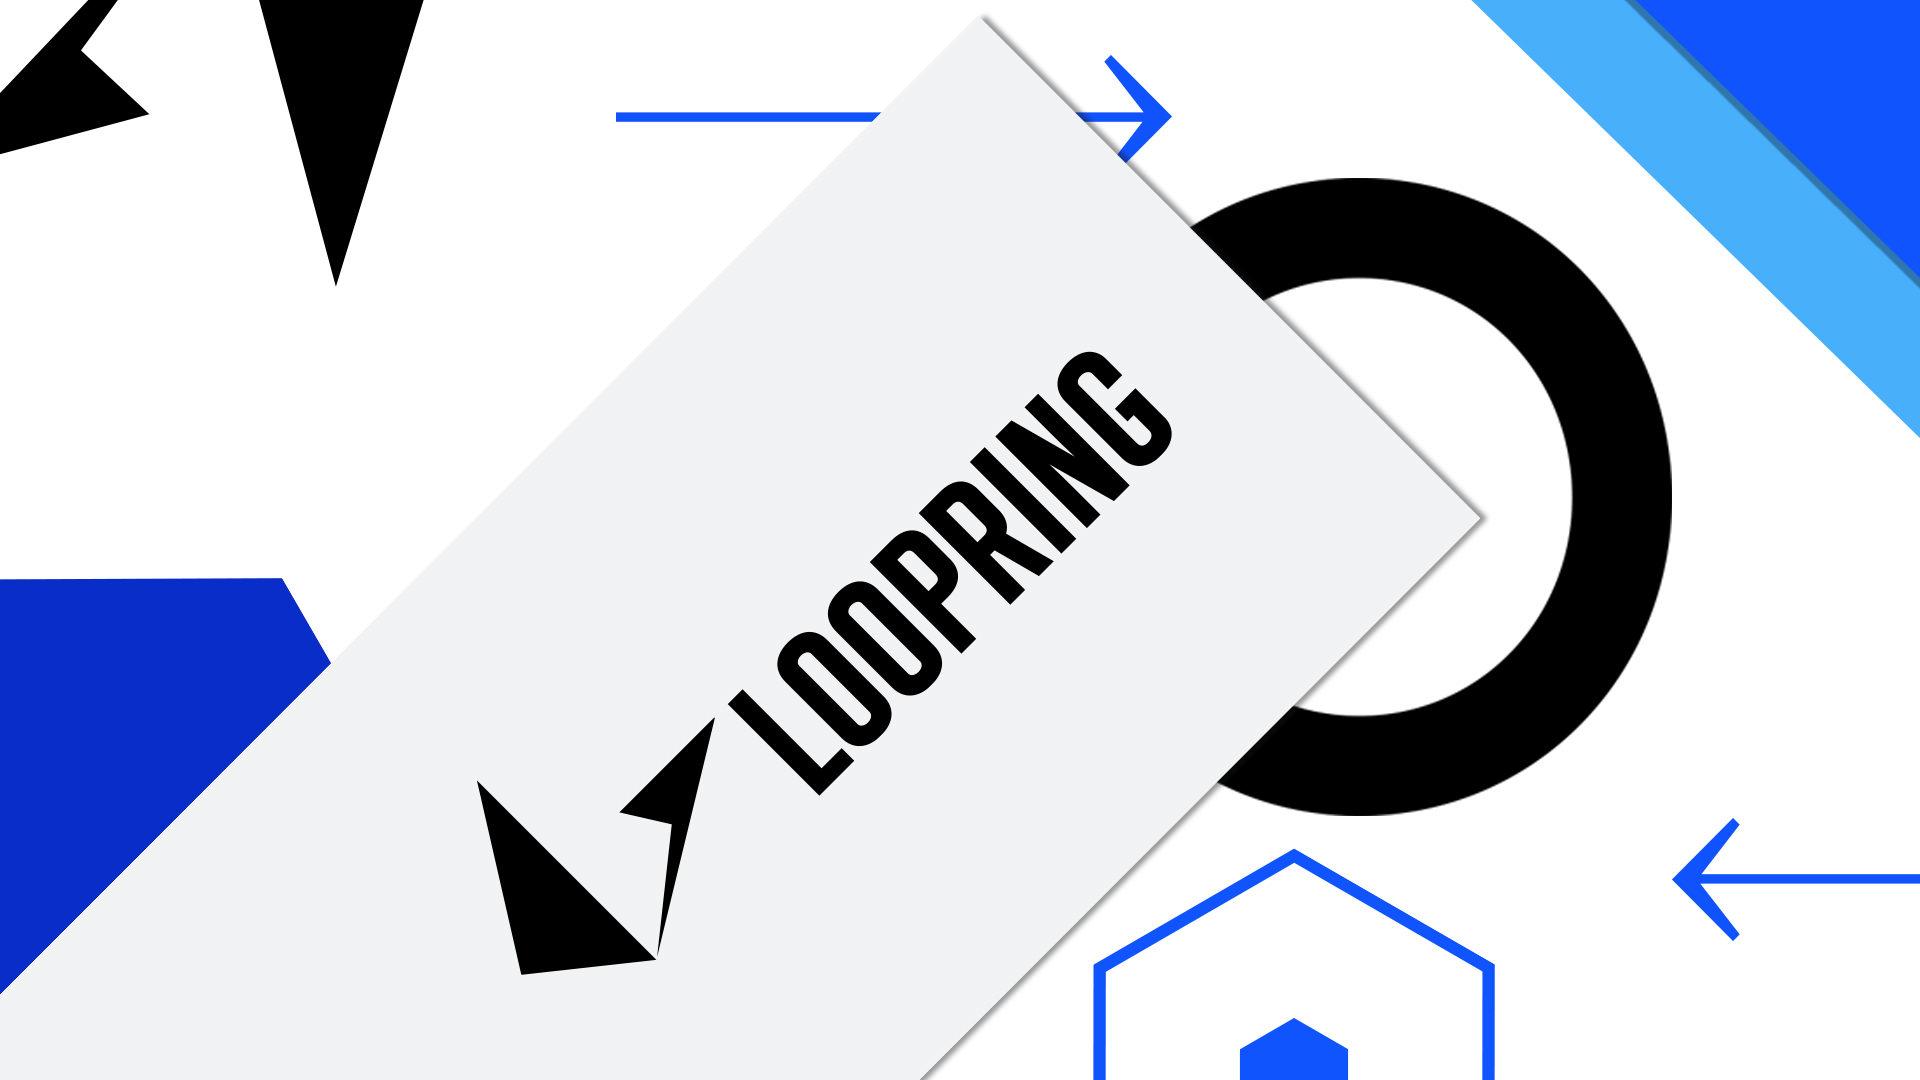 Loopring Website Design and Development